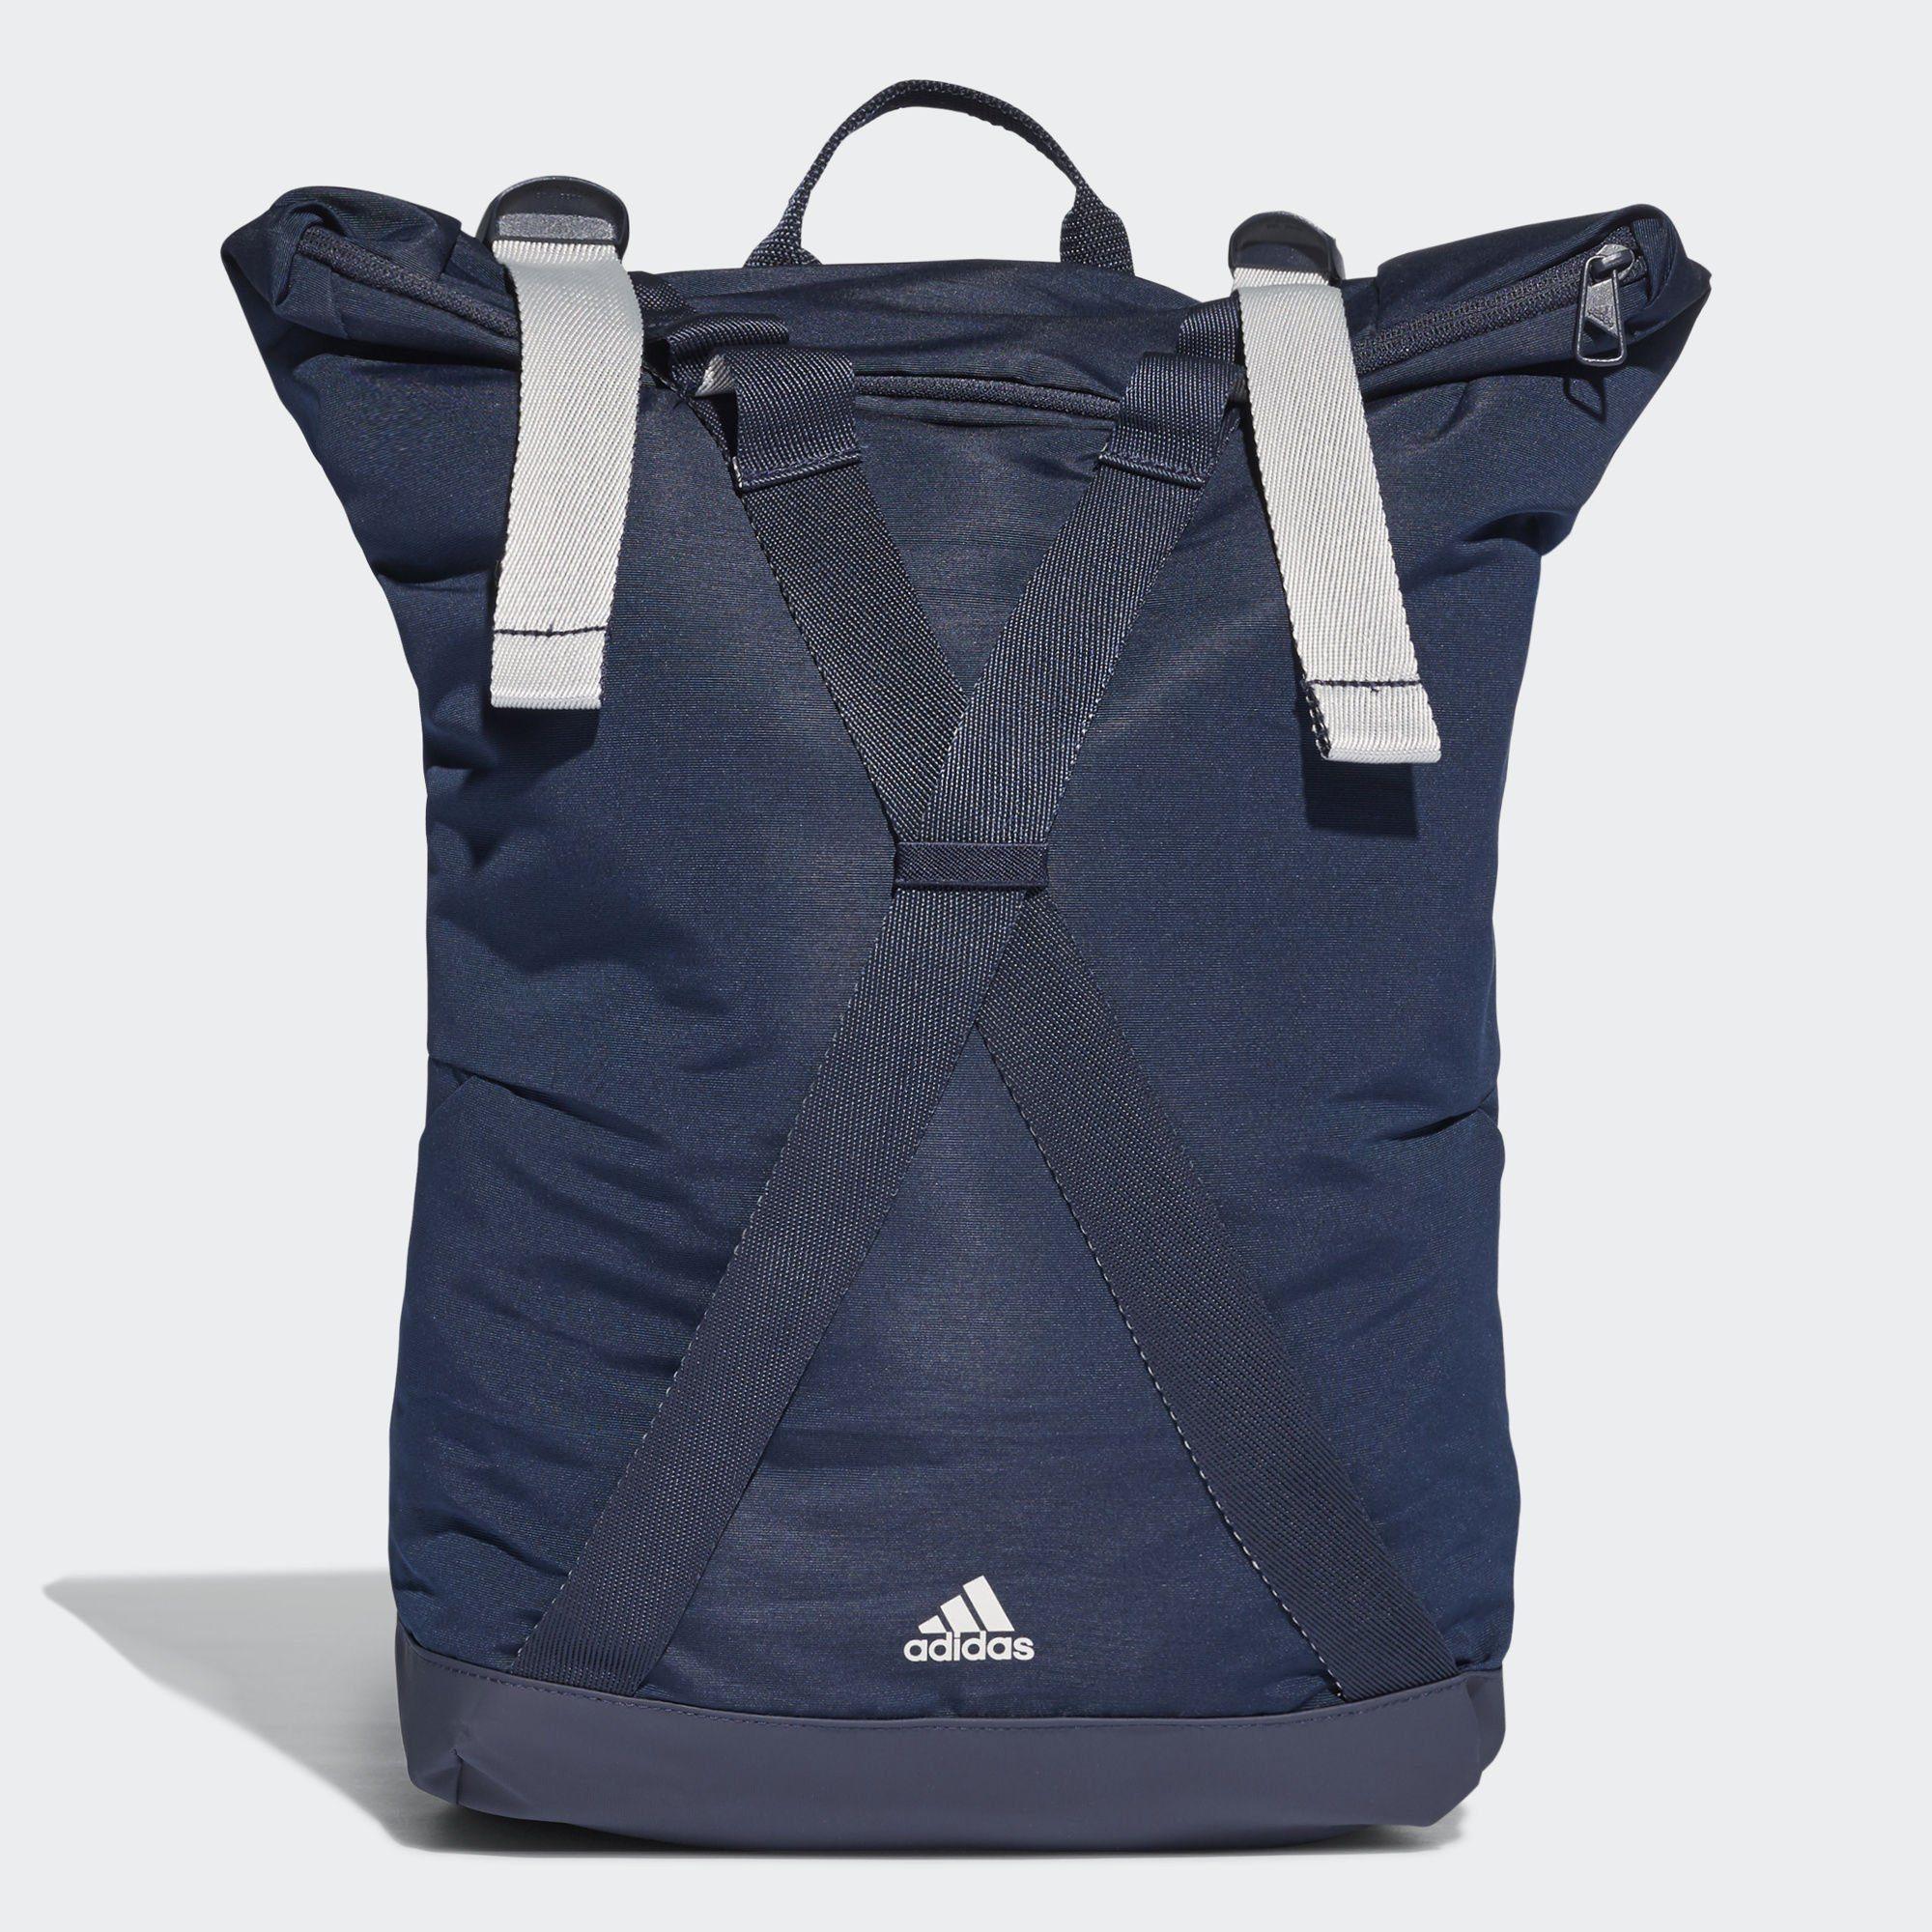 Performance Daypack n Id »adidas e Z Rucksack« Adidas 6HAdqUwH